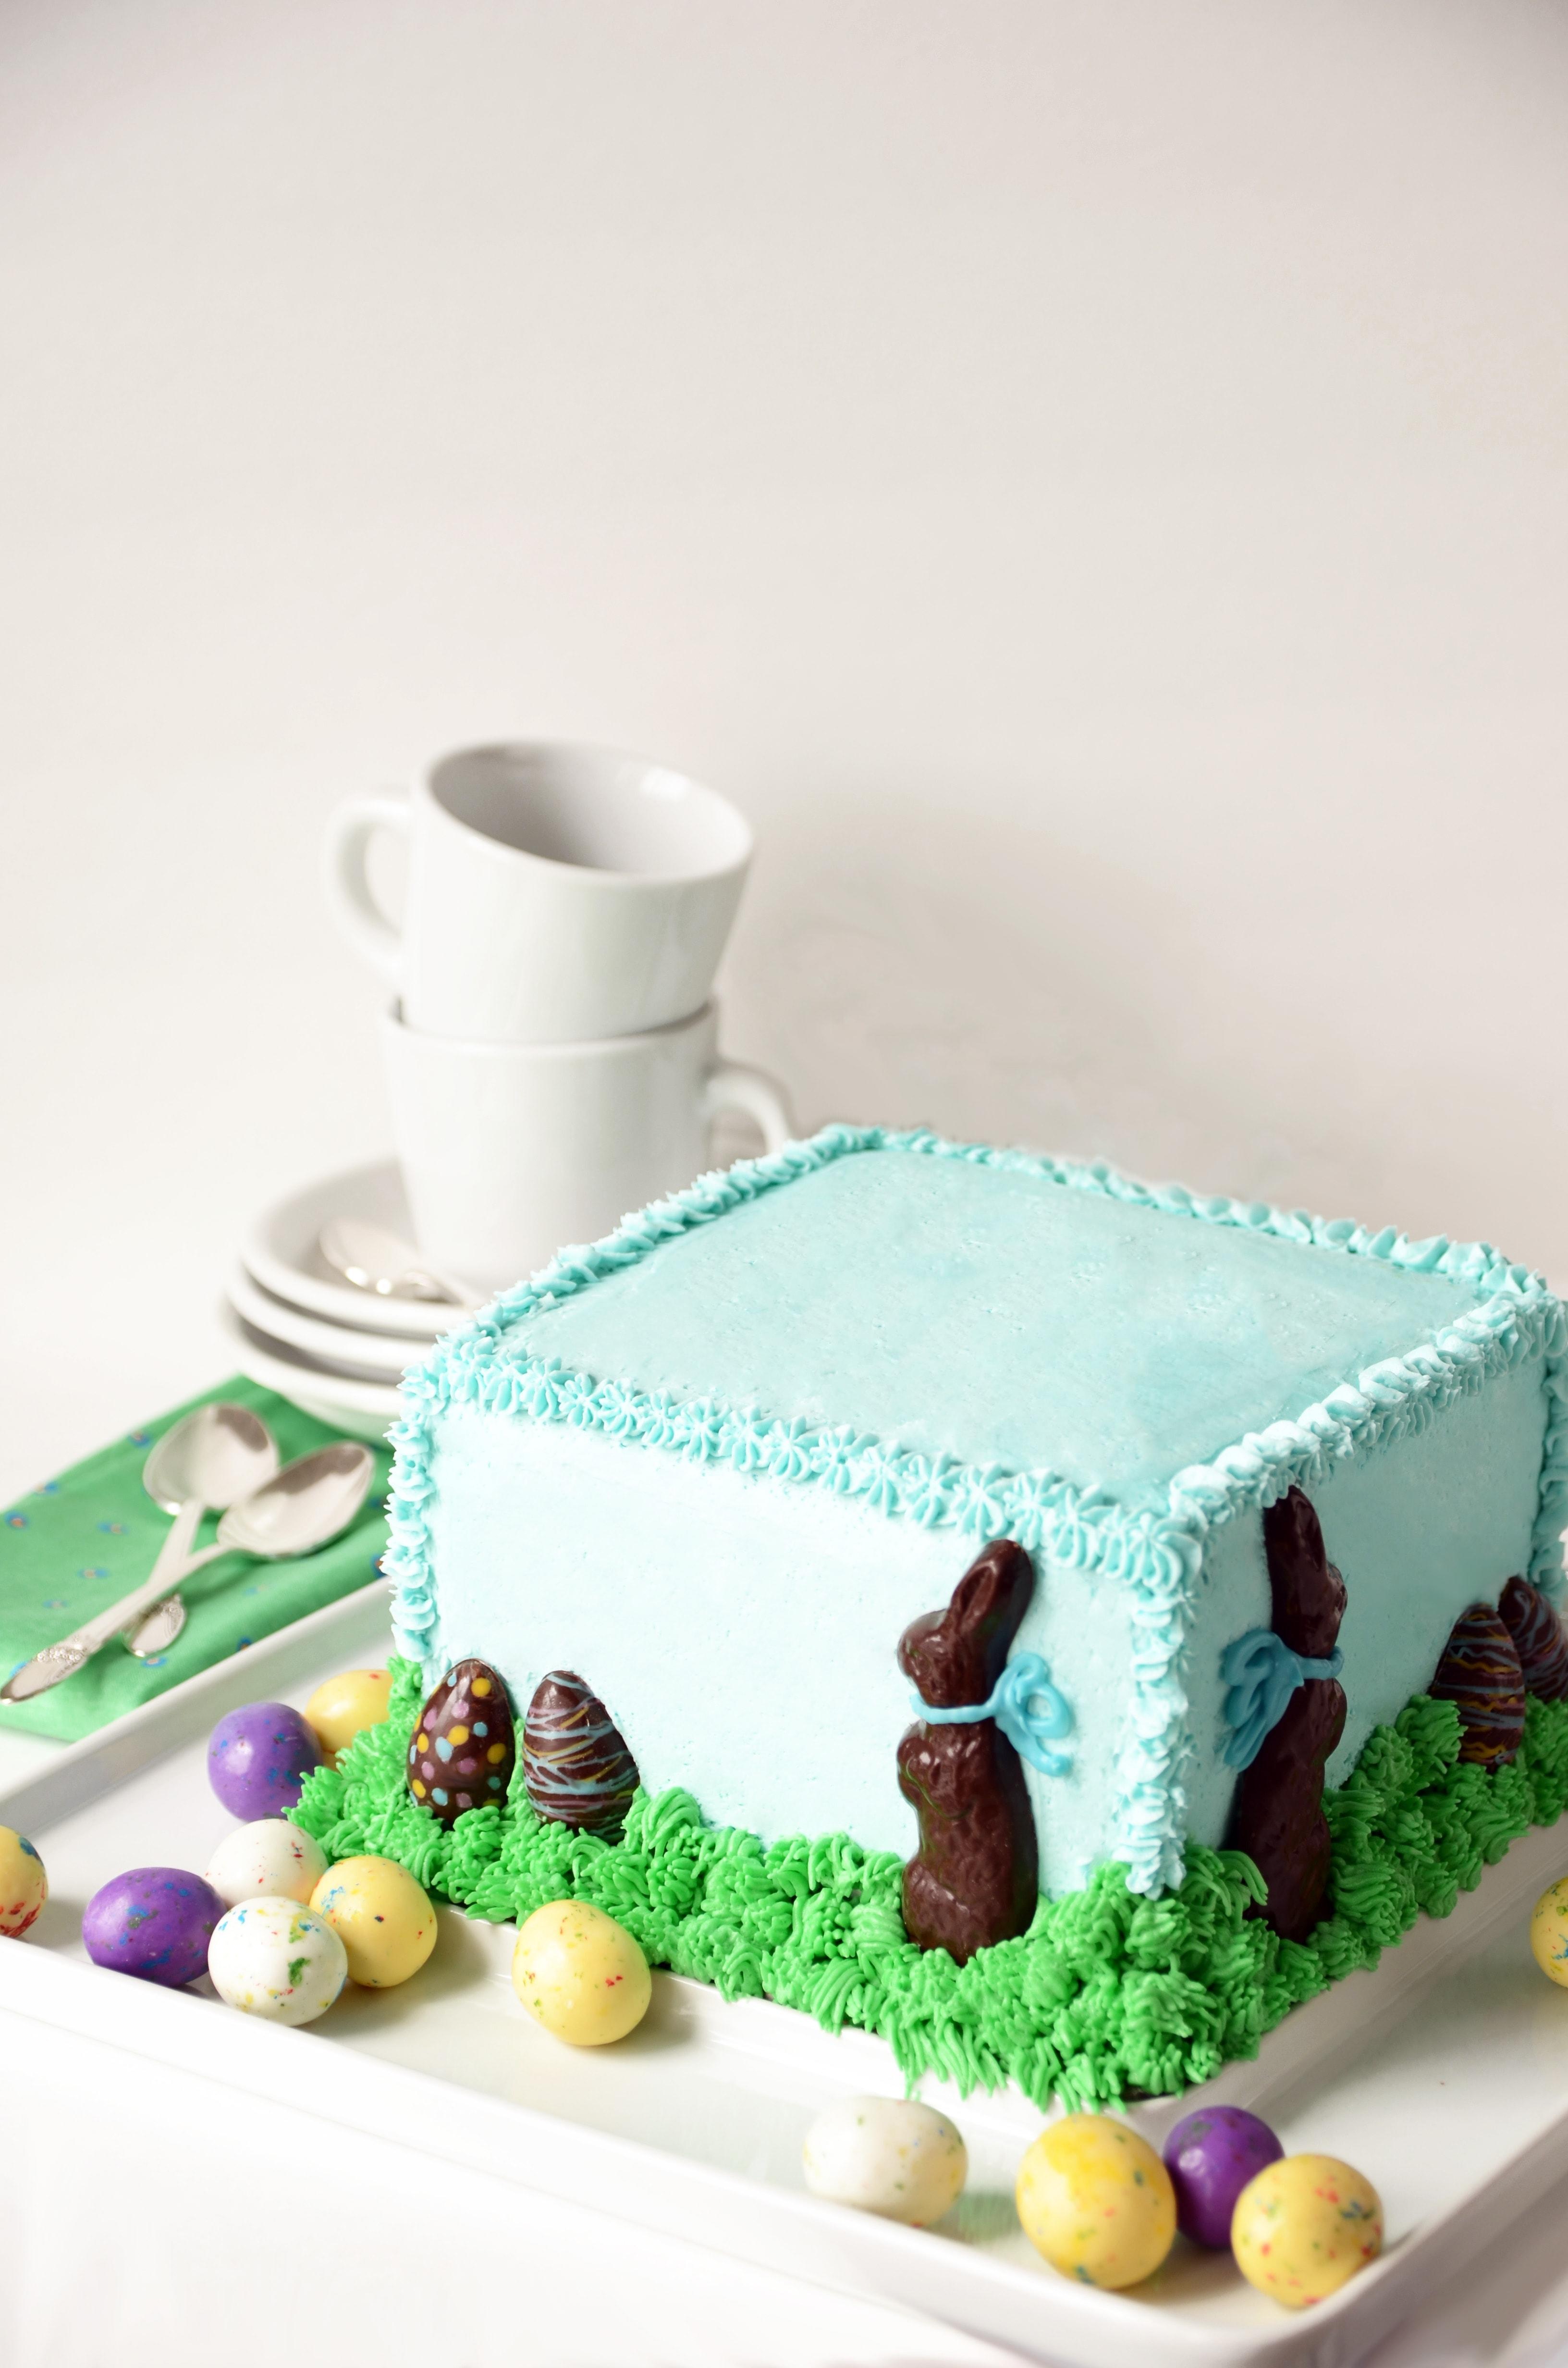 Chocolate Easter Bunny Cake - Vintage Kitty